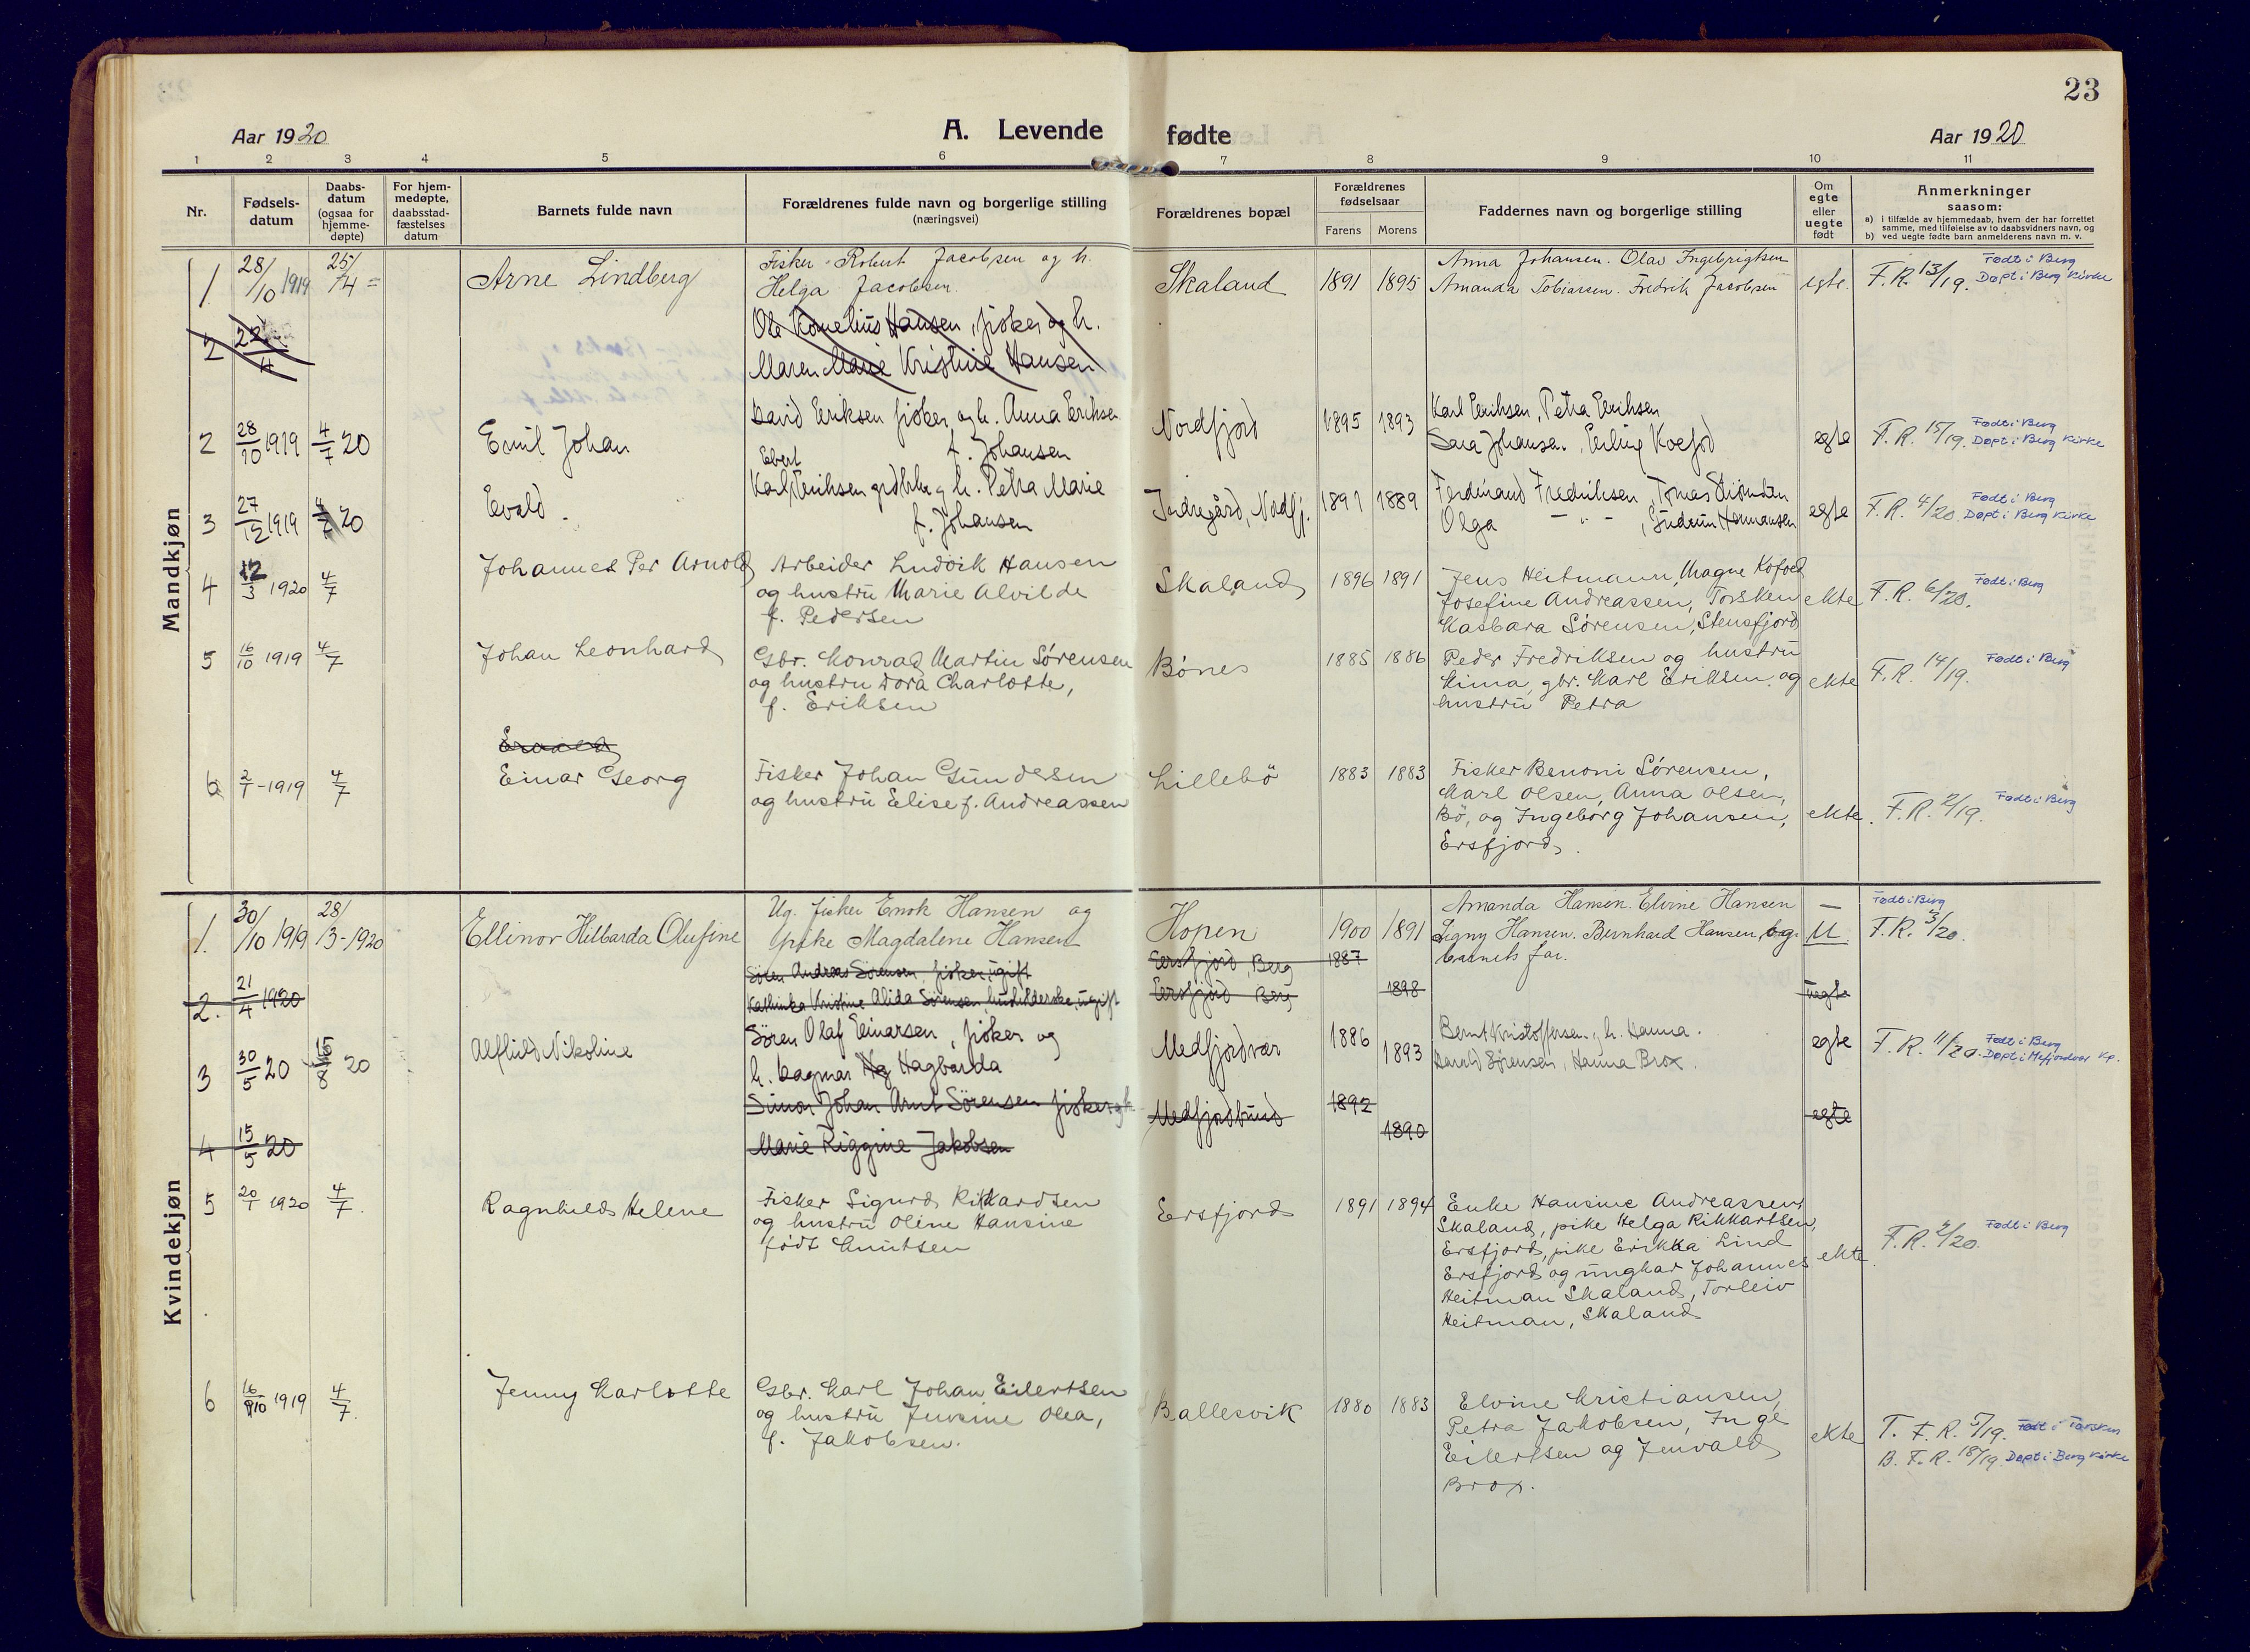 SATØ, Mefjord/Berg sokneprestkontor, G/Ga/Gaa: Ministerialbok nr. 9, 1916-1928, s. 23